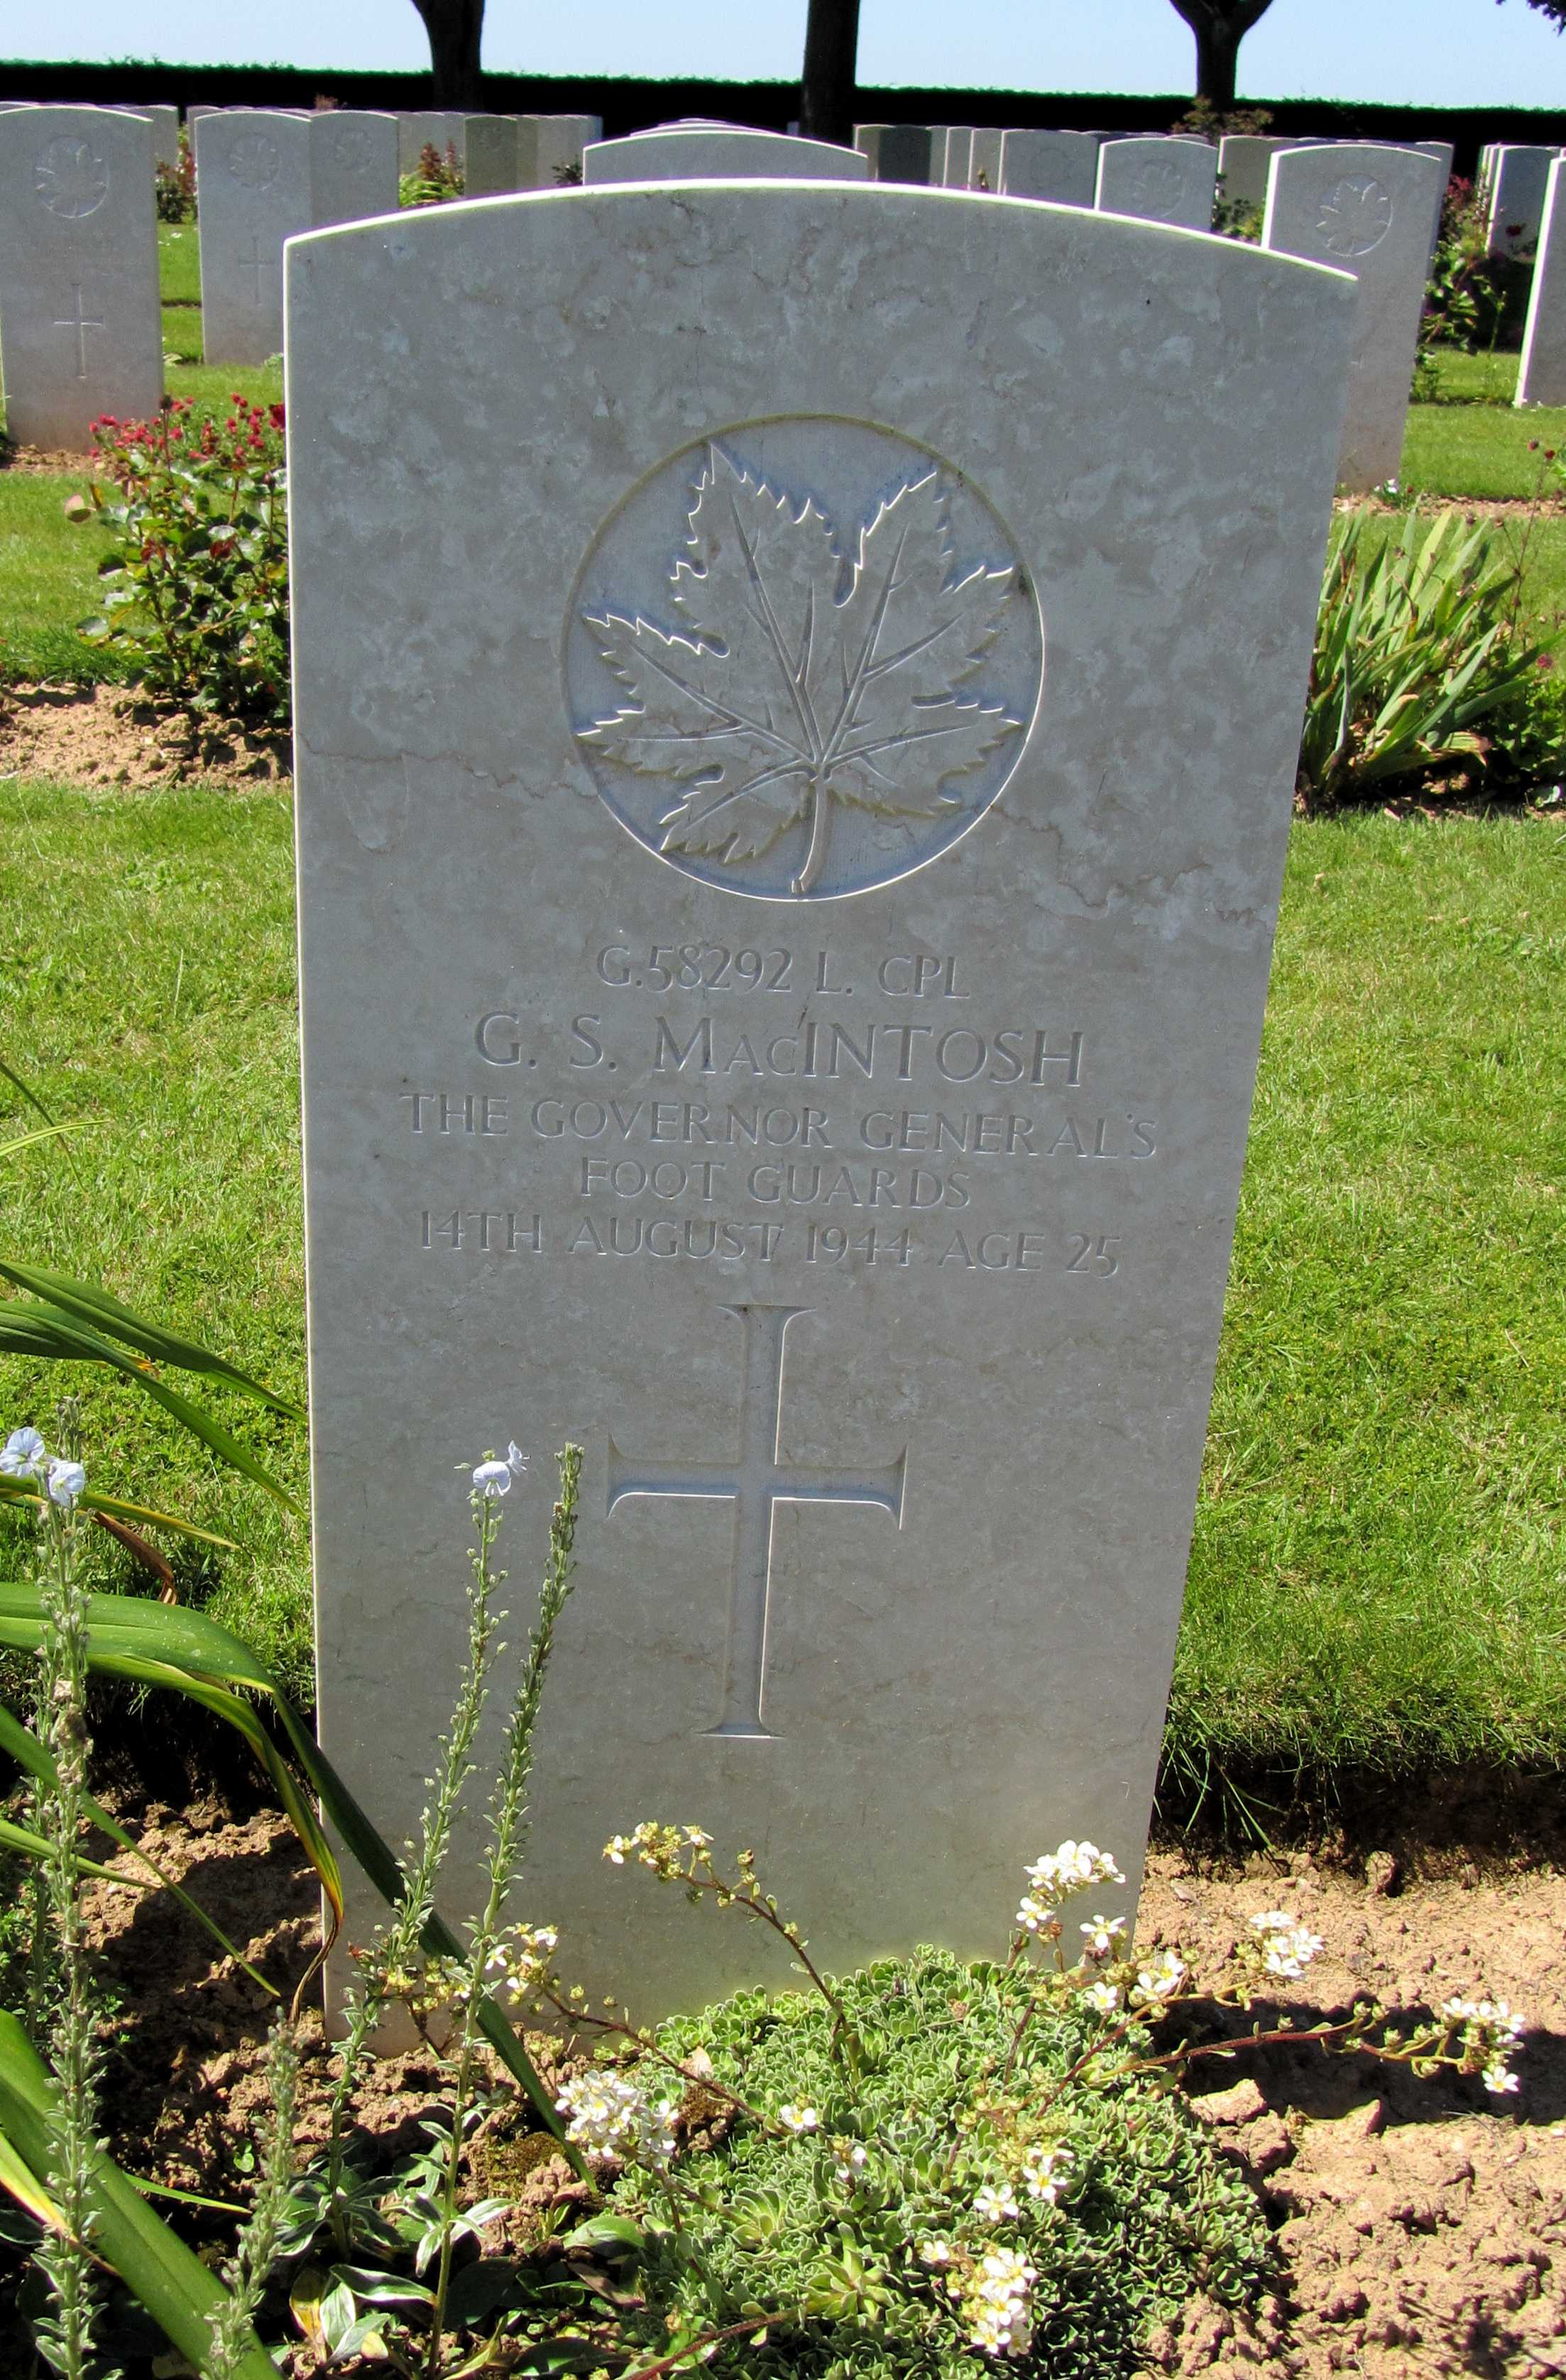 Grave Marker– G.S. MacIntosh G/58292